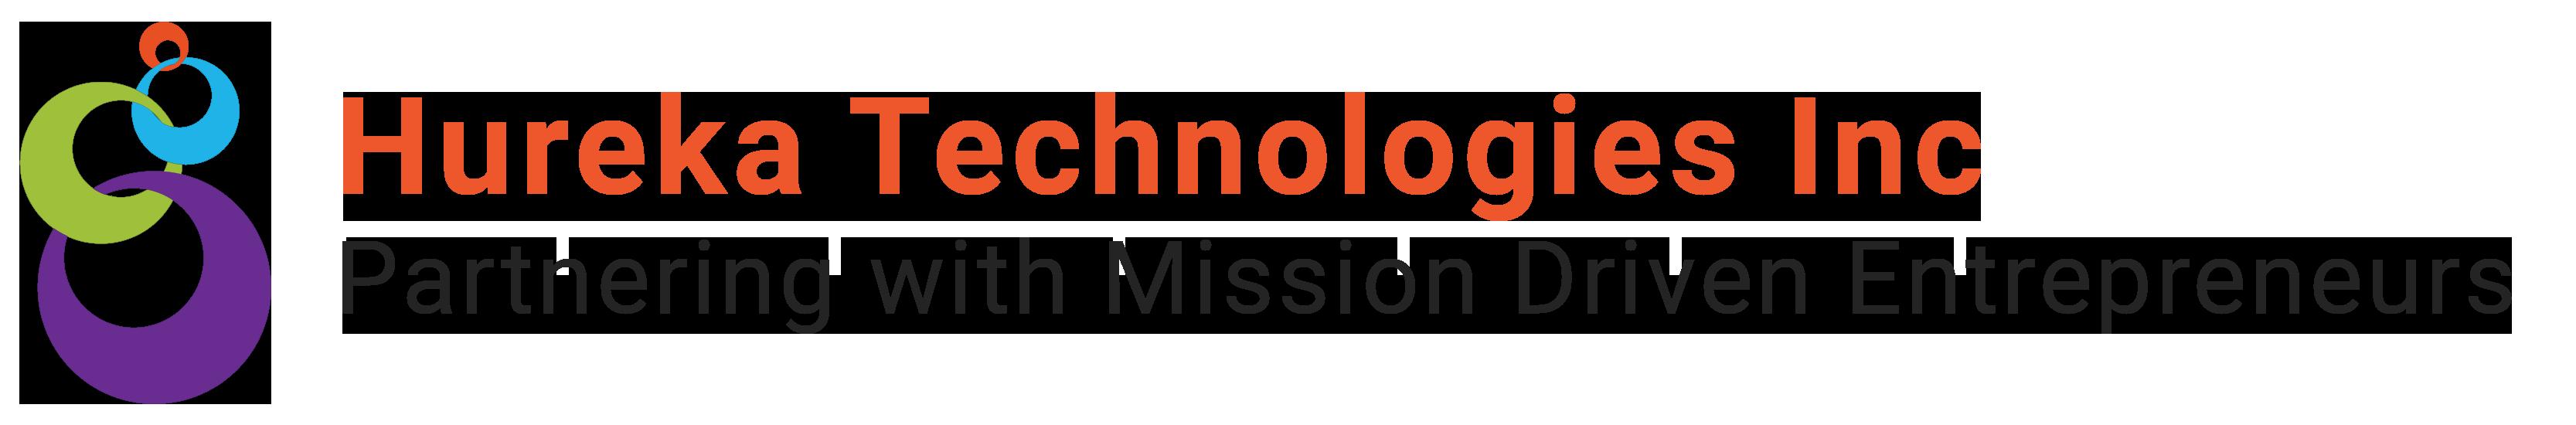 Hureka Technologies LLC, a chatbot developer